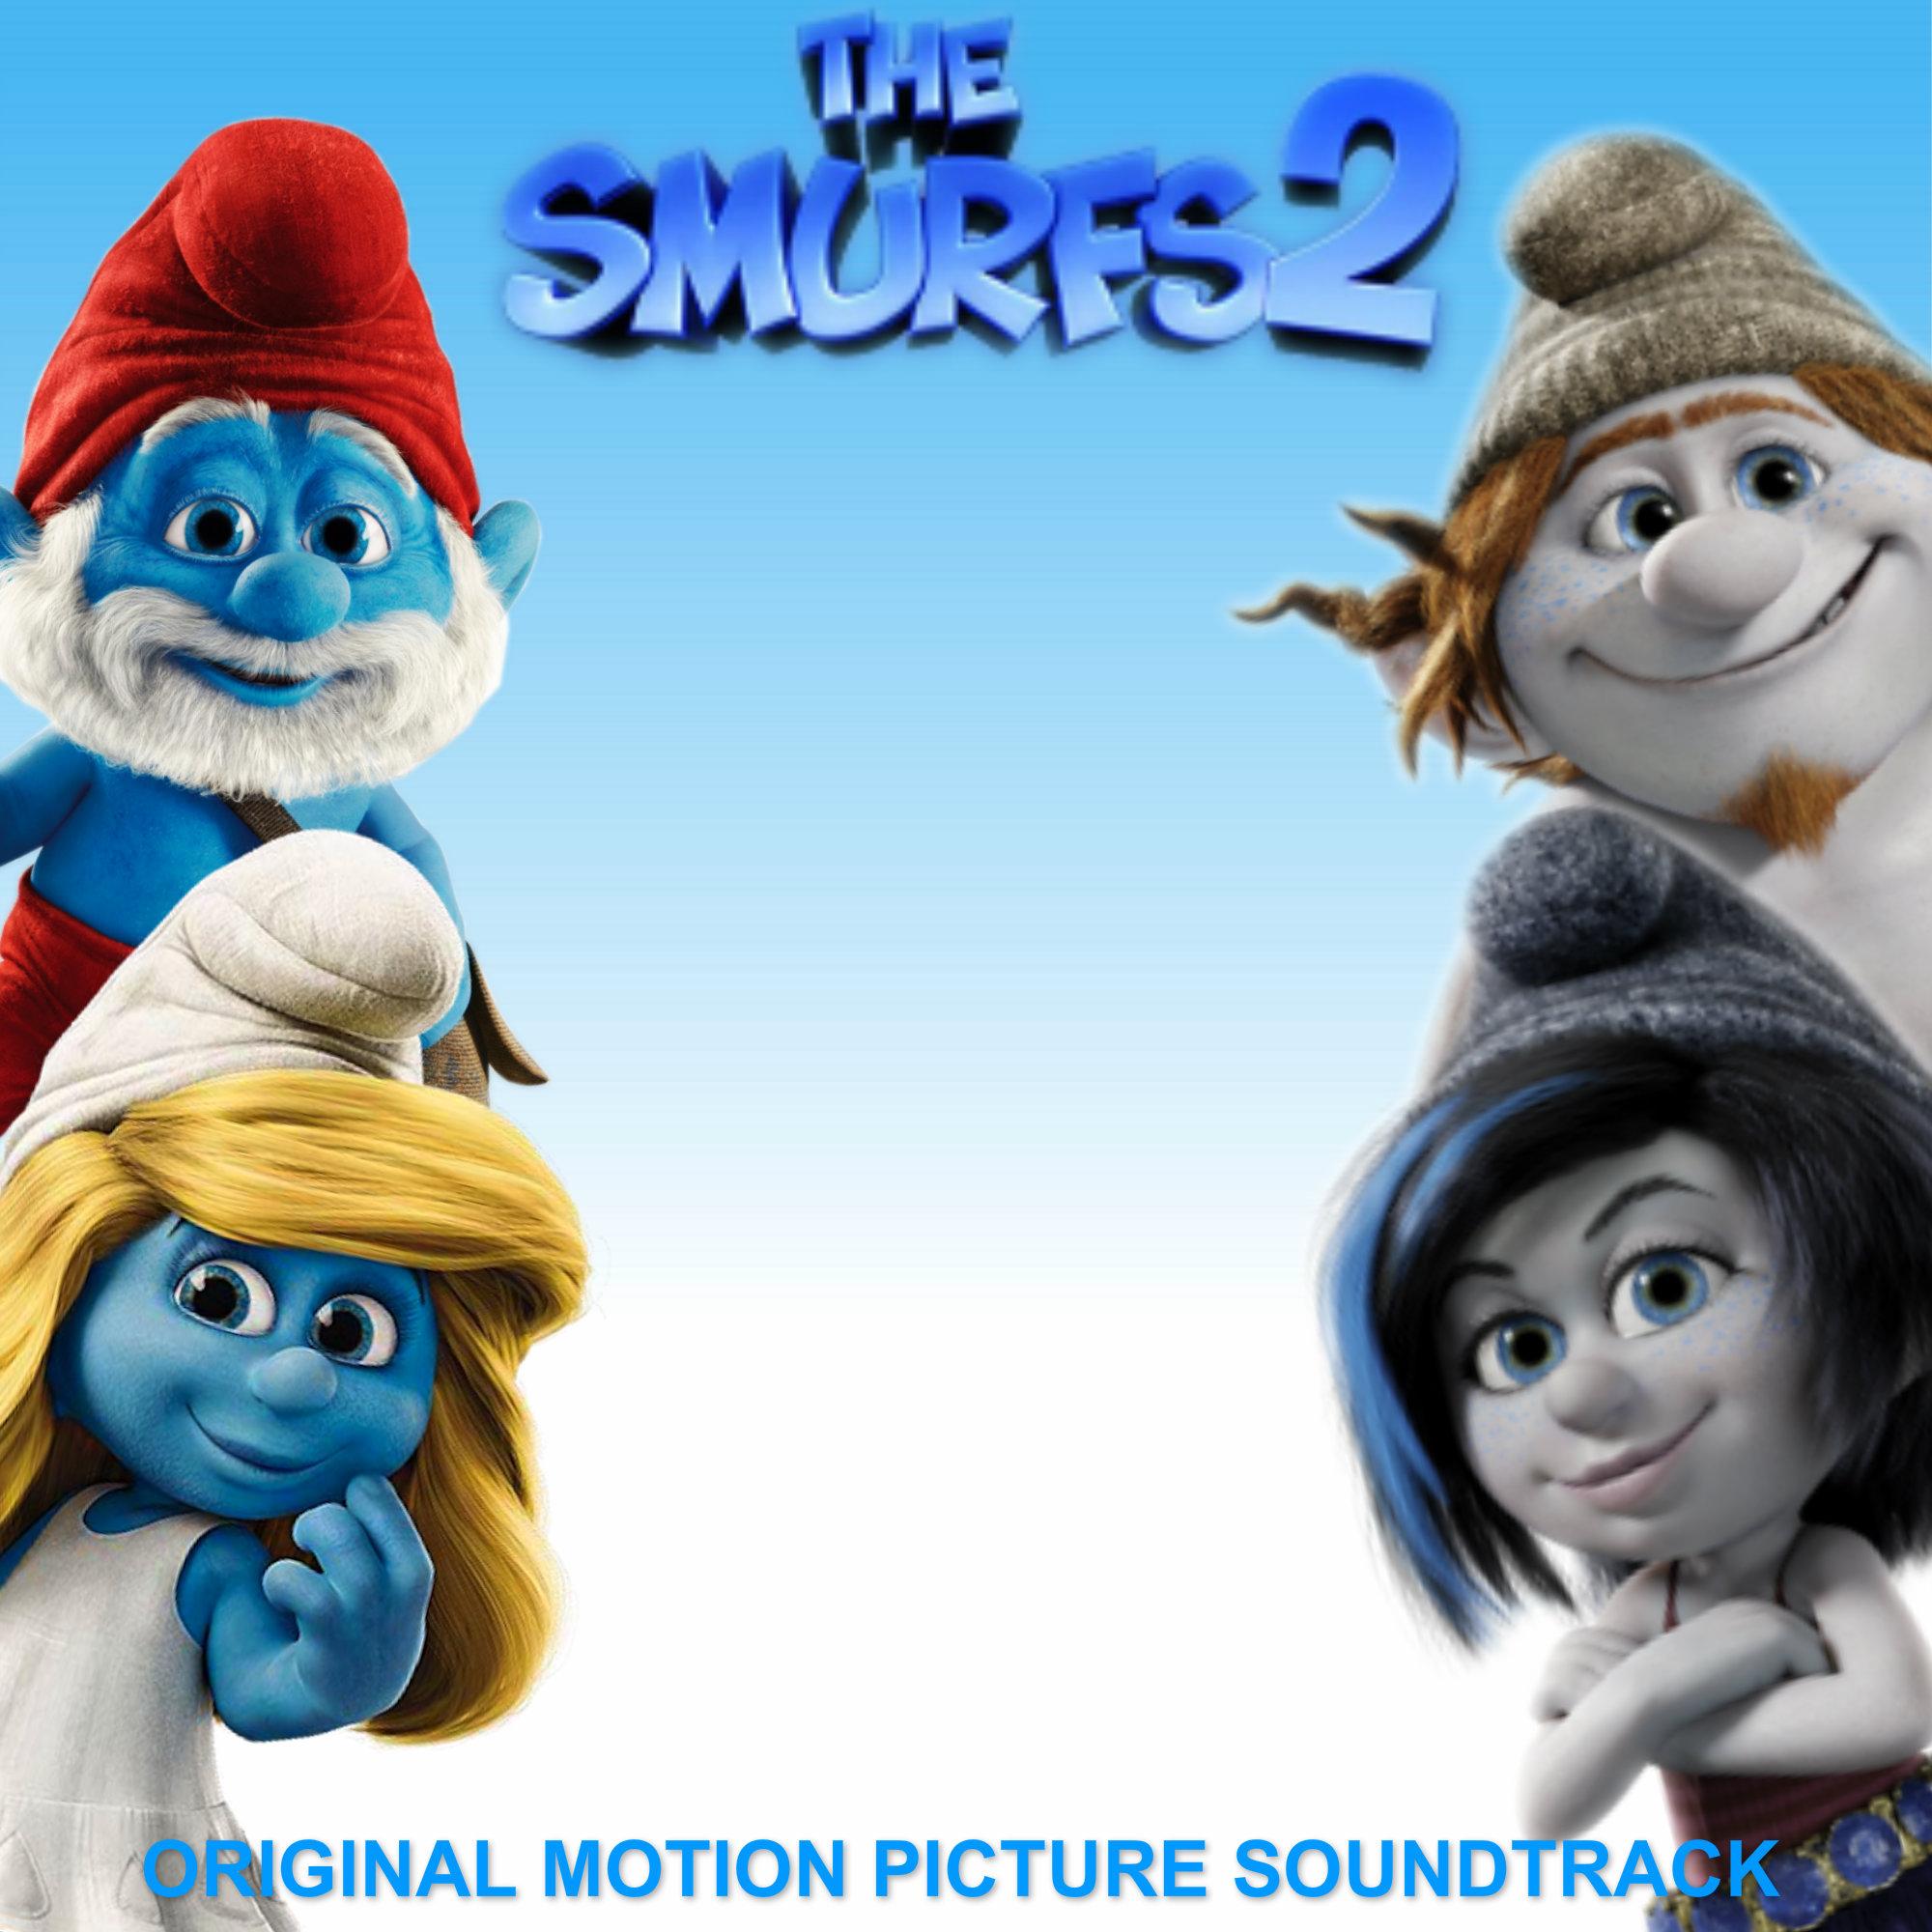 Mamma Mia Here We Go Again Original Motion Picture Soundtrack Cast Of Mamma Mia Here We Go Again: Image - The Smurfs 2 Soundtrack.jpg